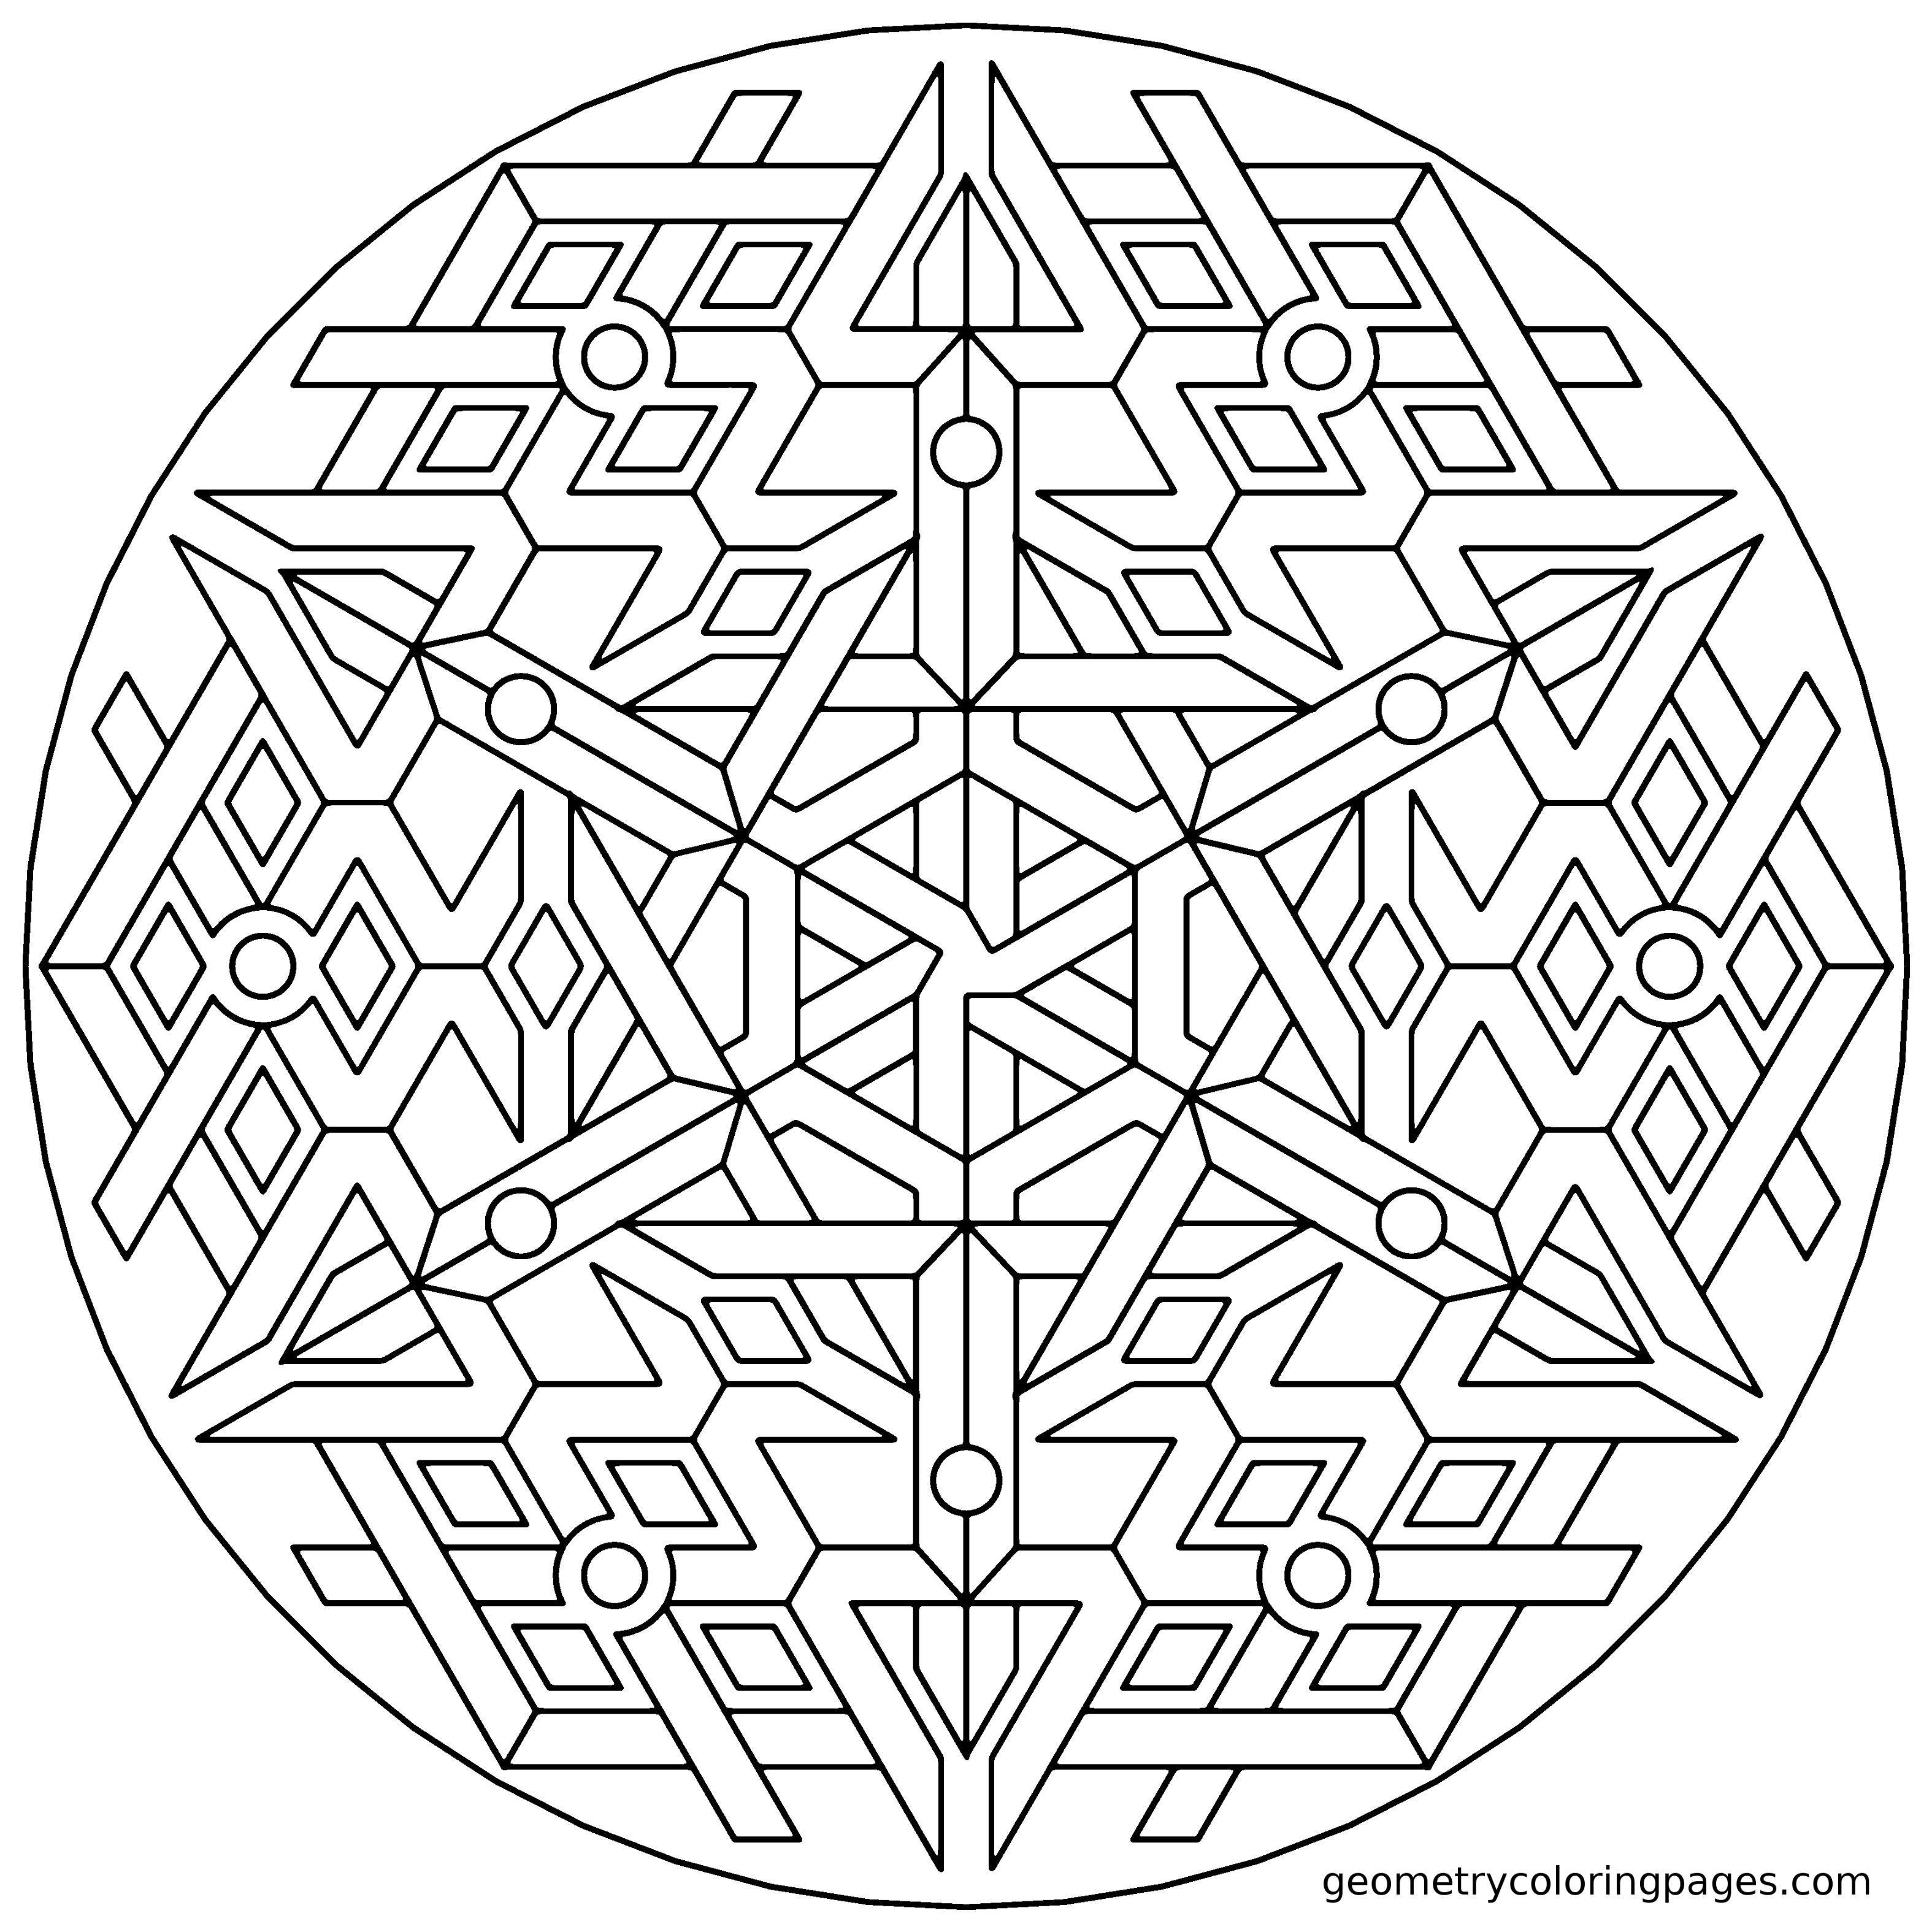 Coloring Meditations - Imgur   Coloring fun   Pinterest   Mandalas ...